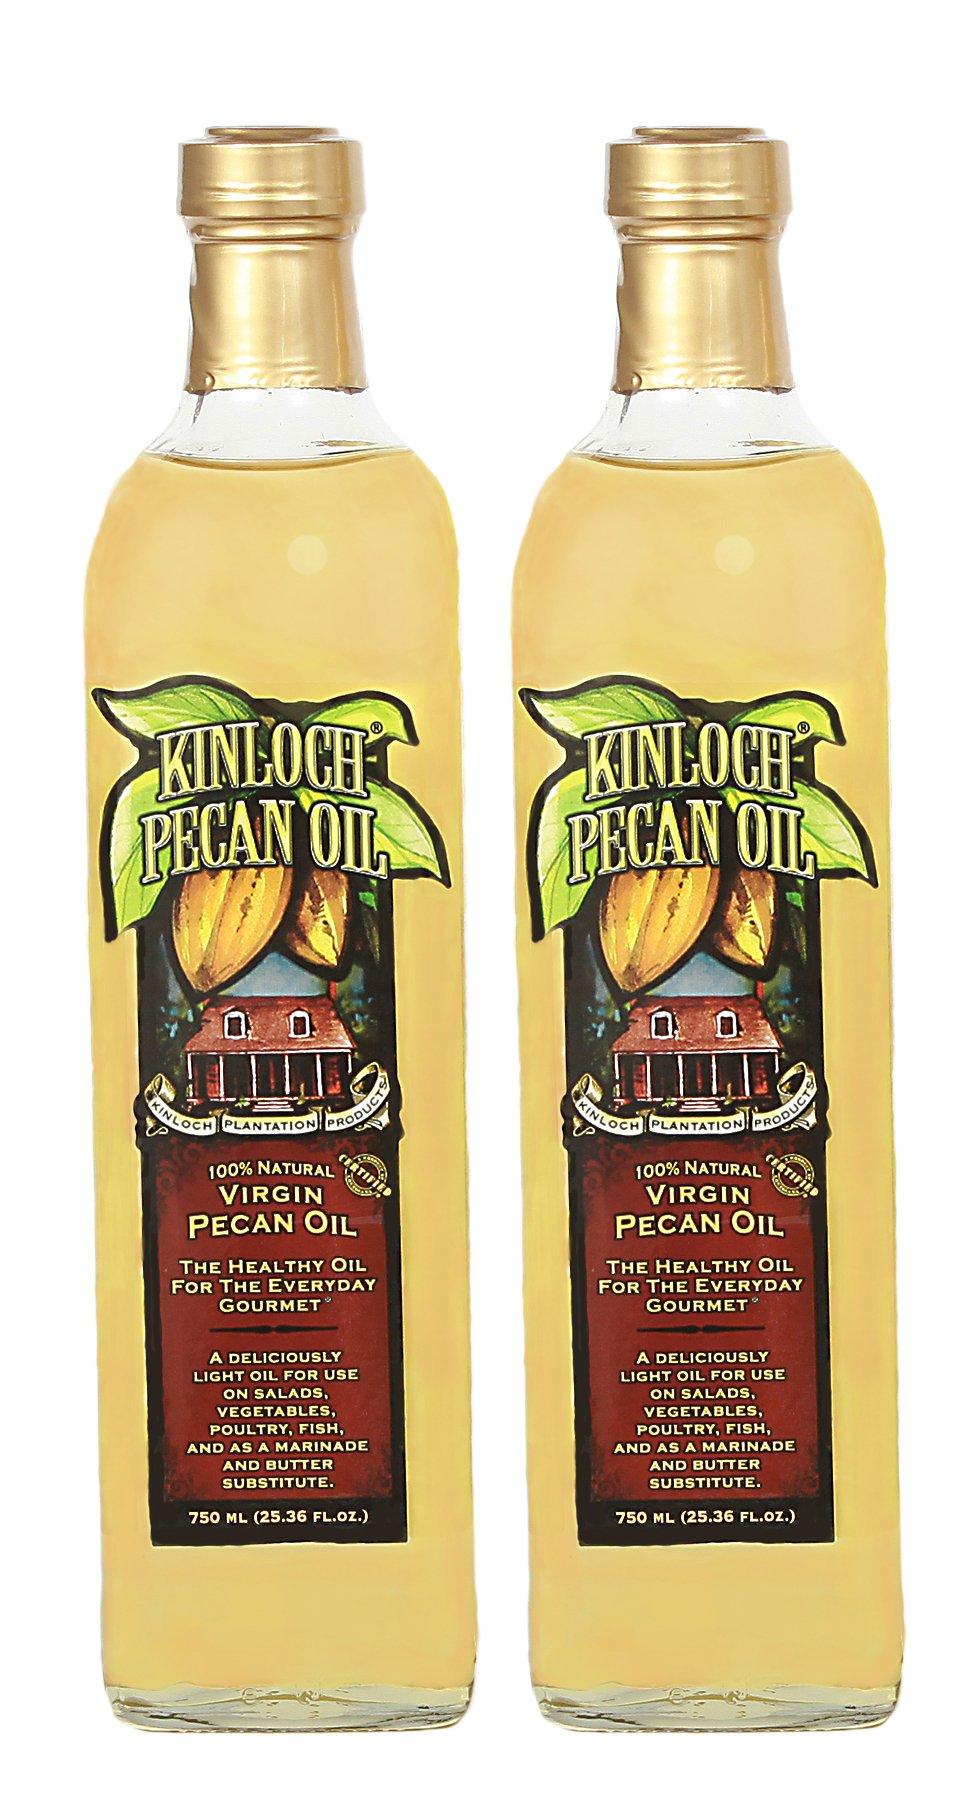 Kinloch Plantation Products Pecan Oil,  Two (2) 750 ML Bottles by Kinloch Plantation